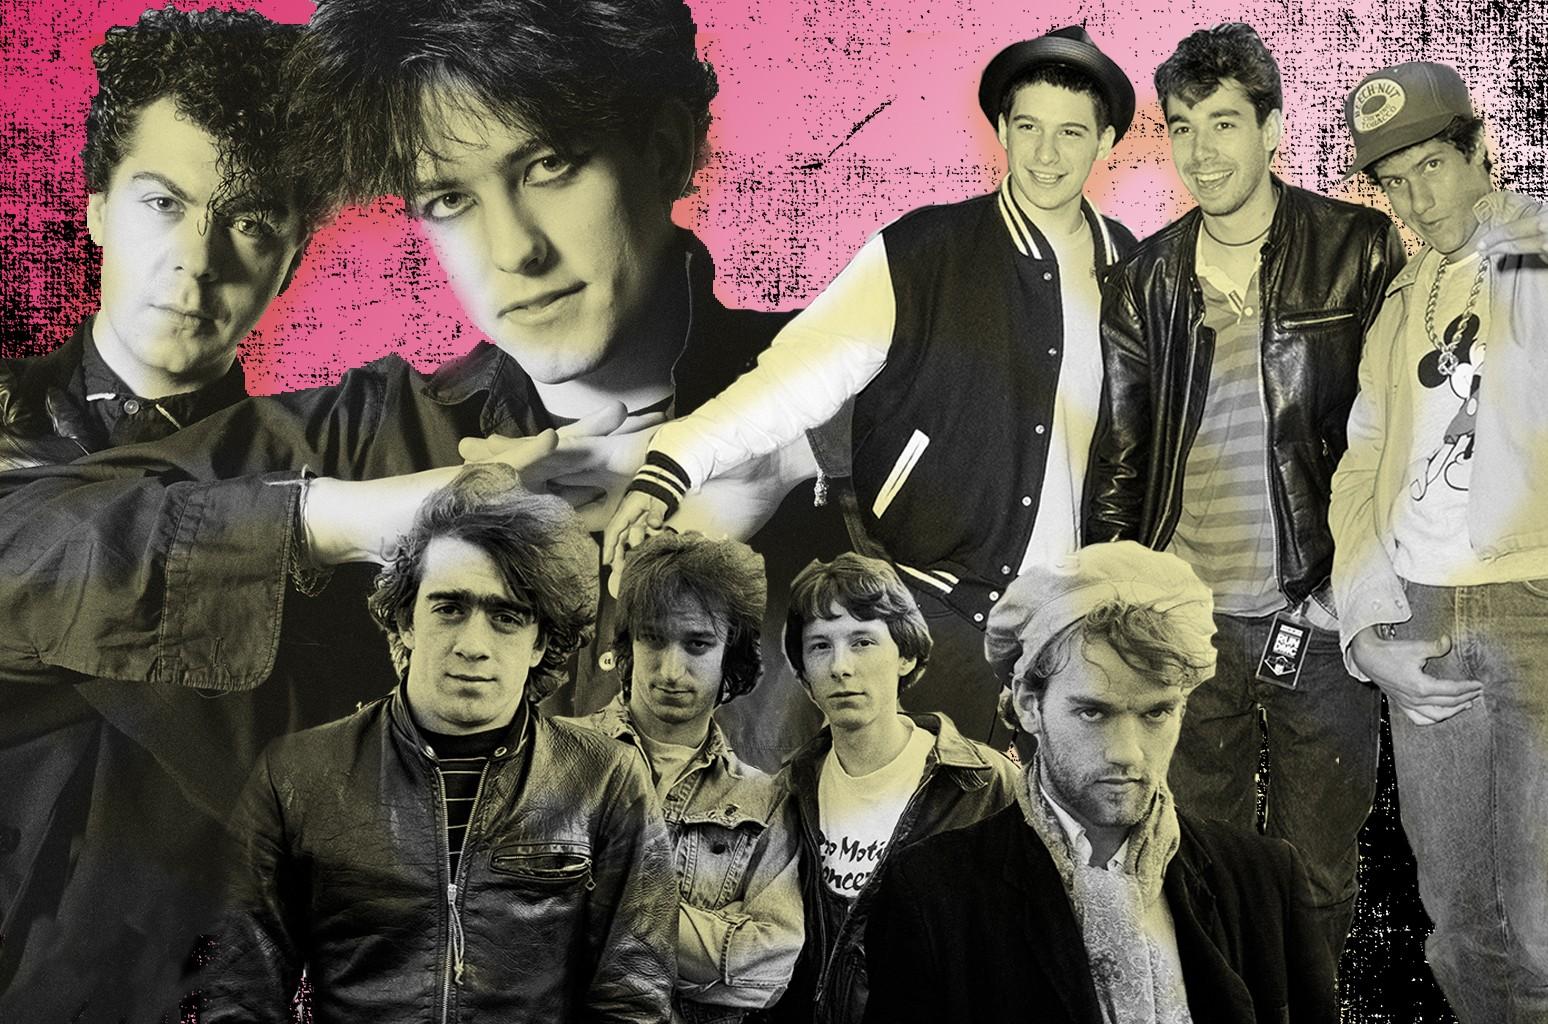 The Cure, R.E.M. & Beastie Boys